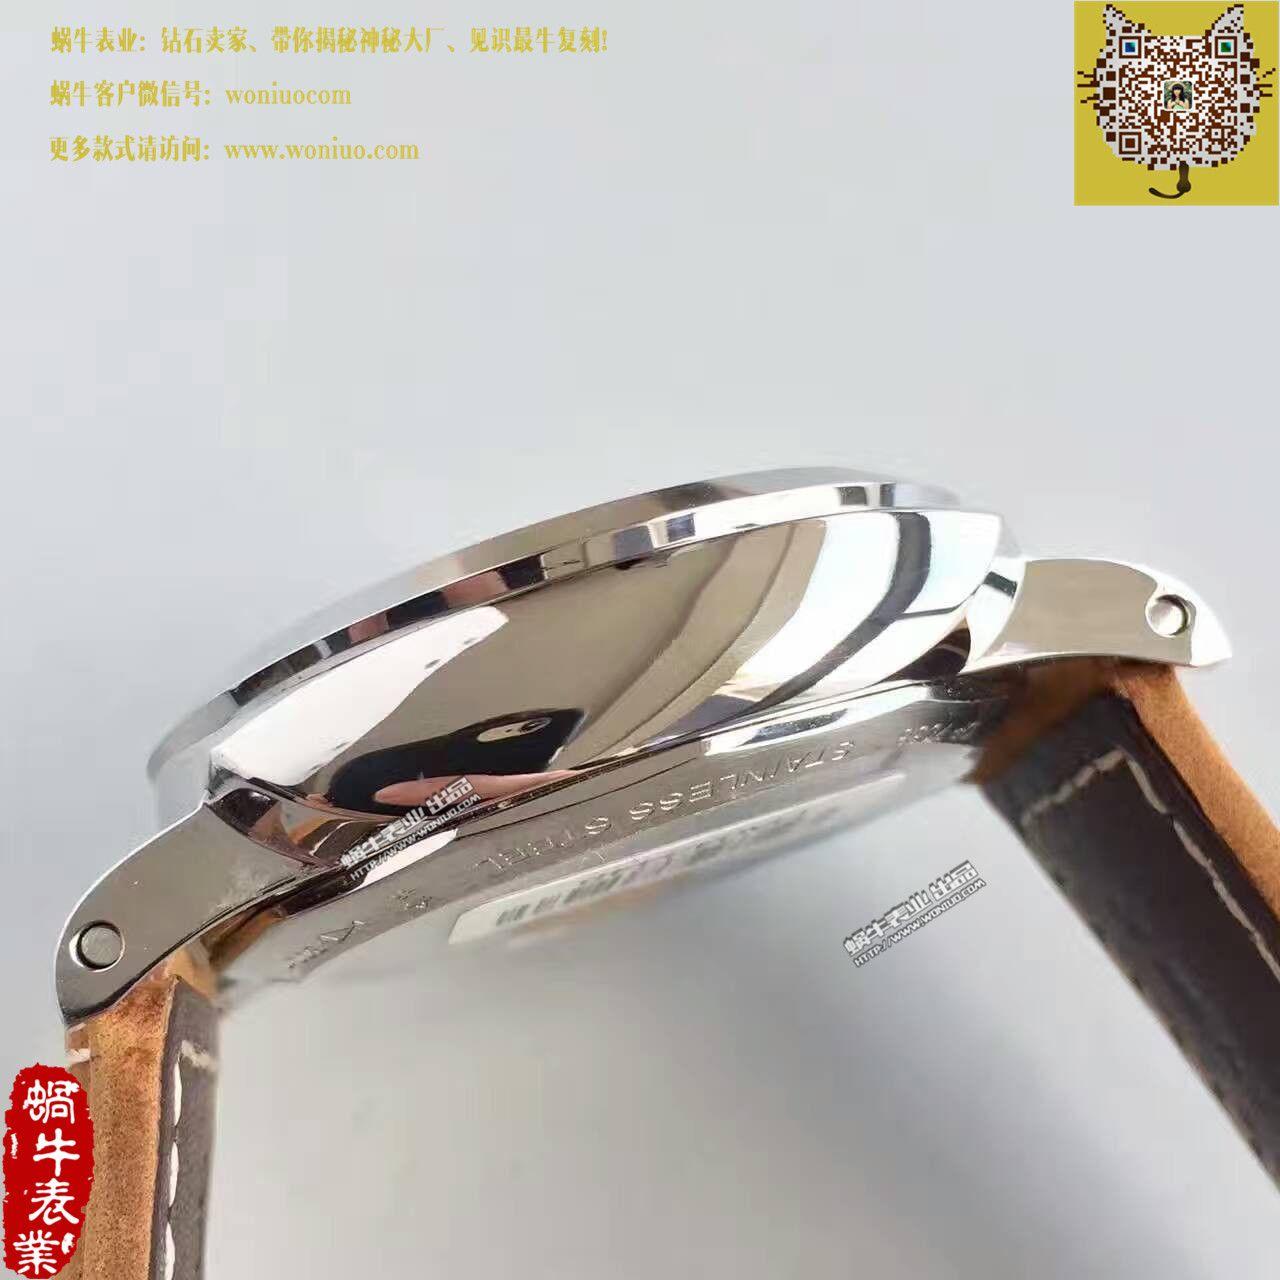 【ZF一比一超A高仿手表】沛纳海LUMINOR 1950系列PAM01499腕表 / PA002